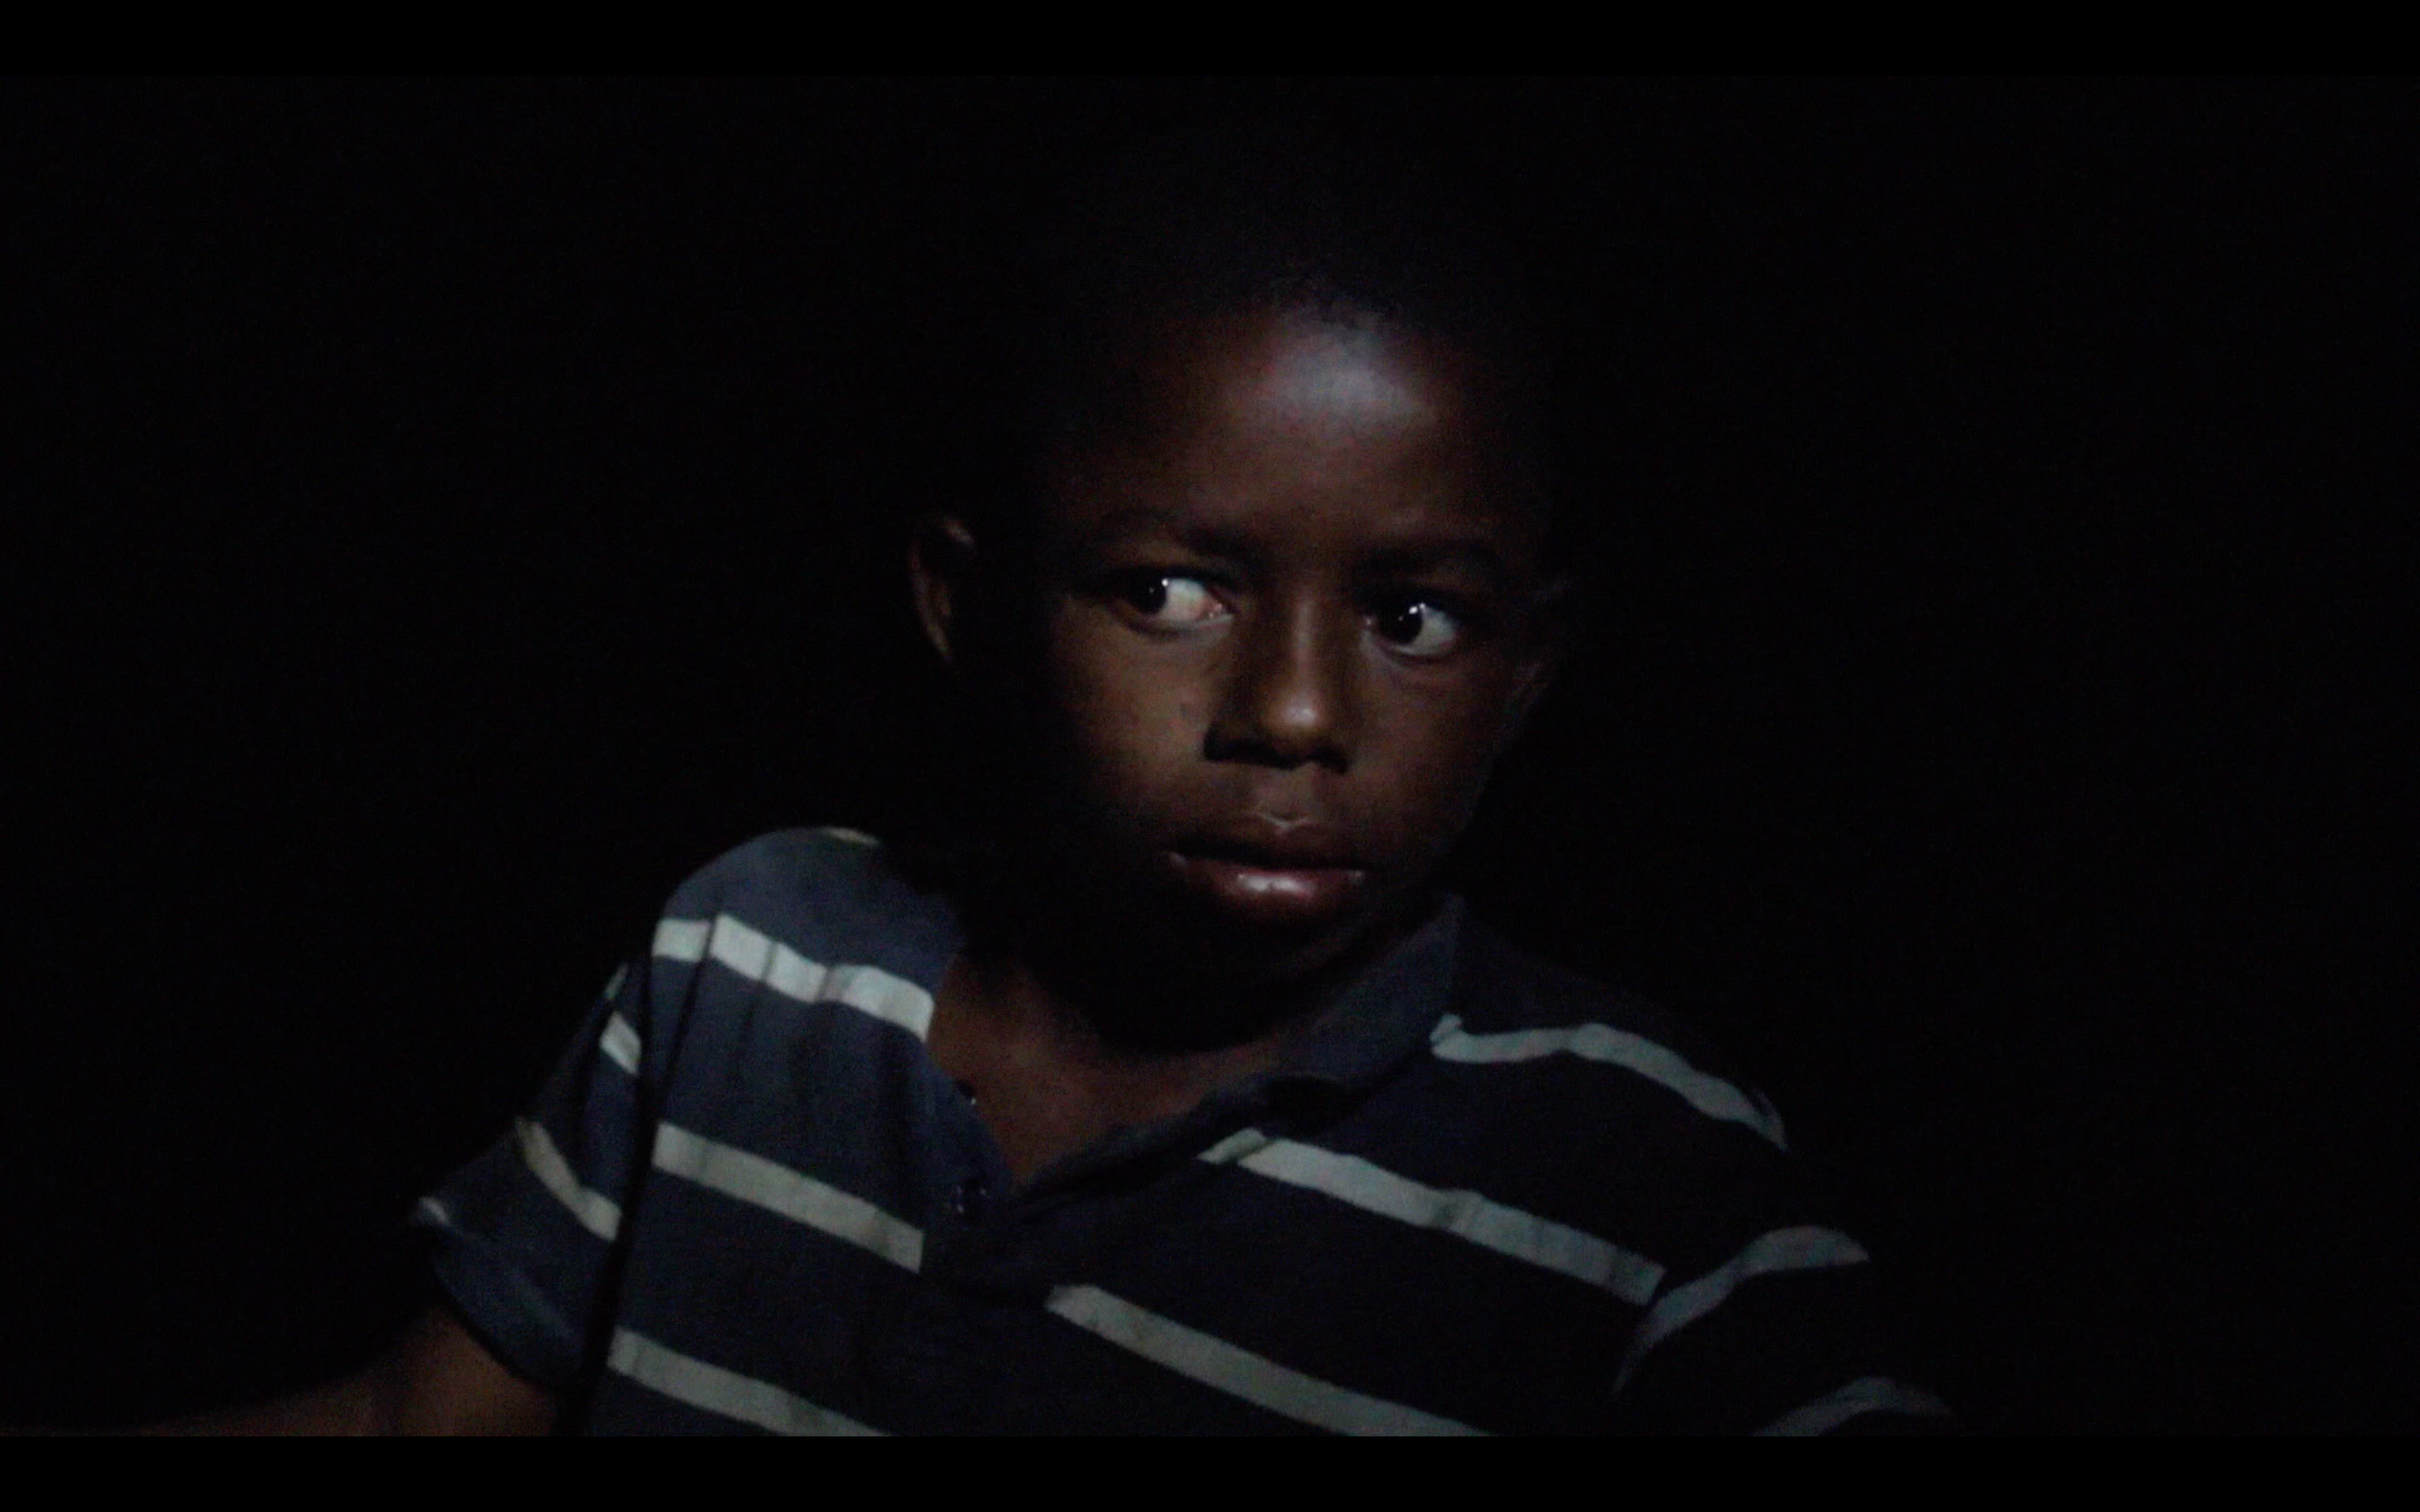 Épisode 1/3 : Koropa, le premier film de Laura Henno